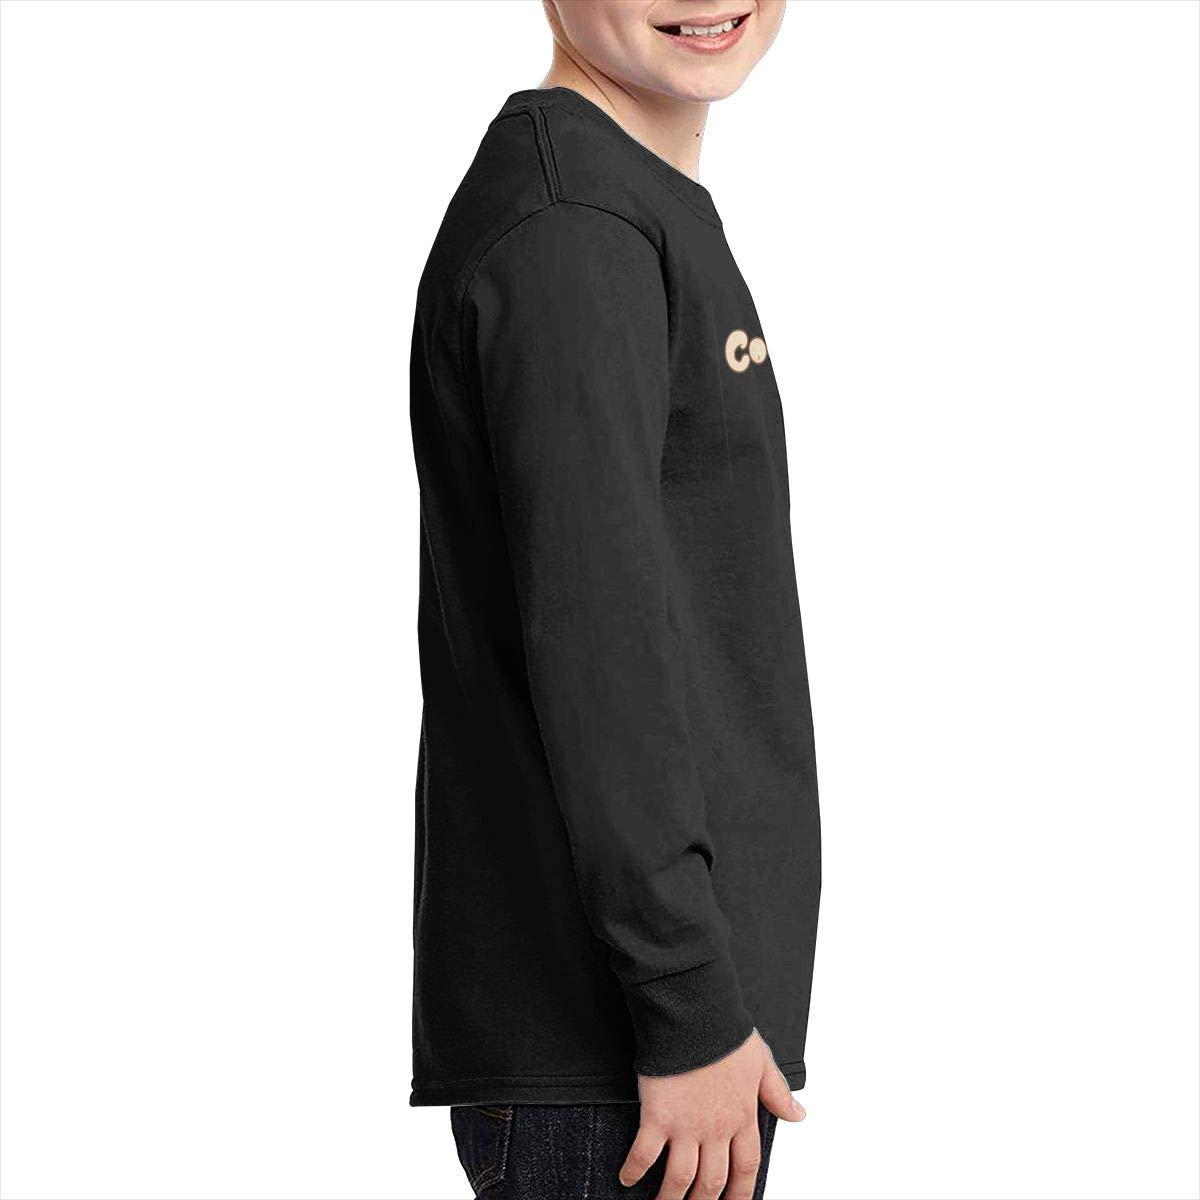 Optumus Cookie Swirl Kids Sweatshirts Long Sleeve T Shirt Boy Girl Children Teenagers Unisex Tee